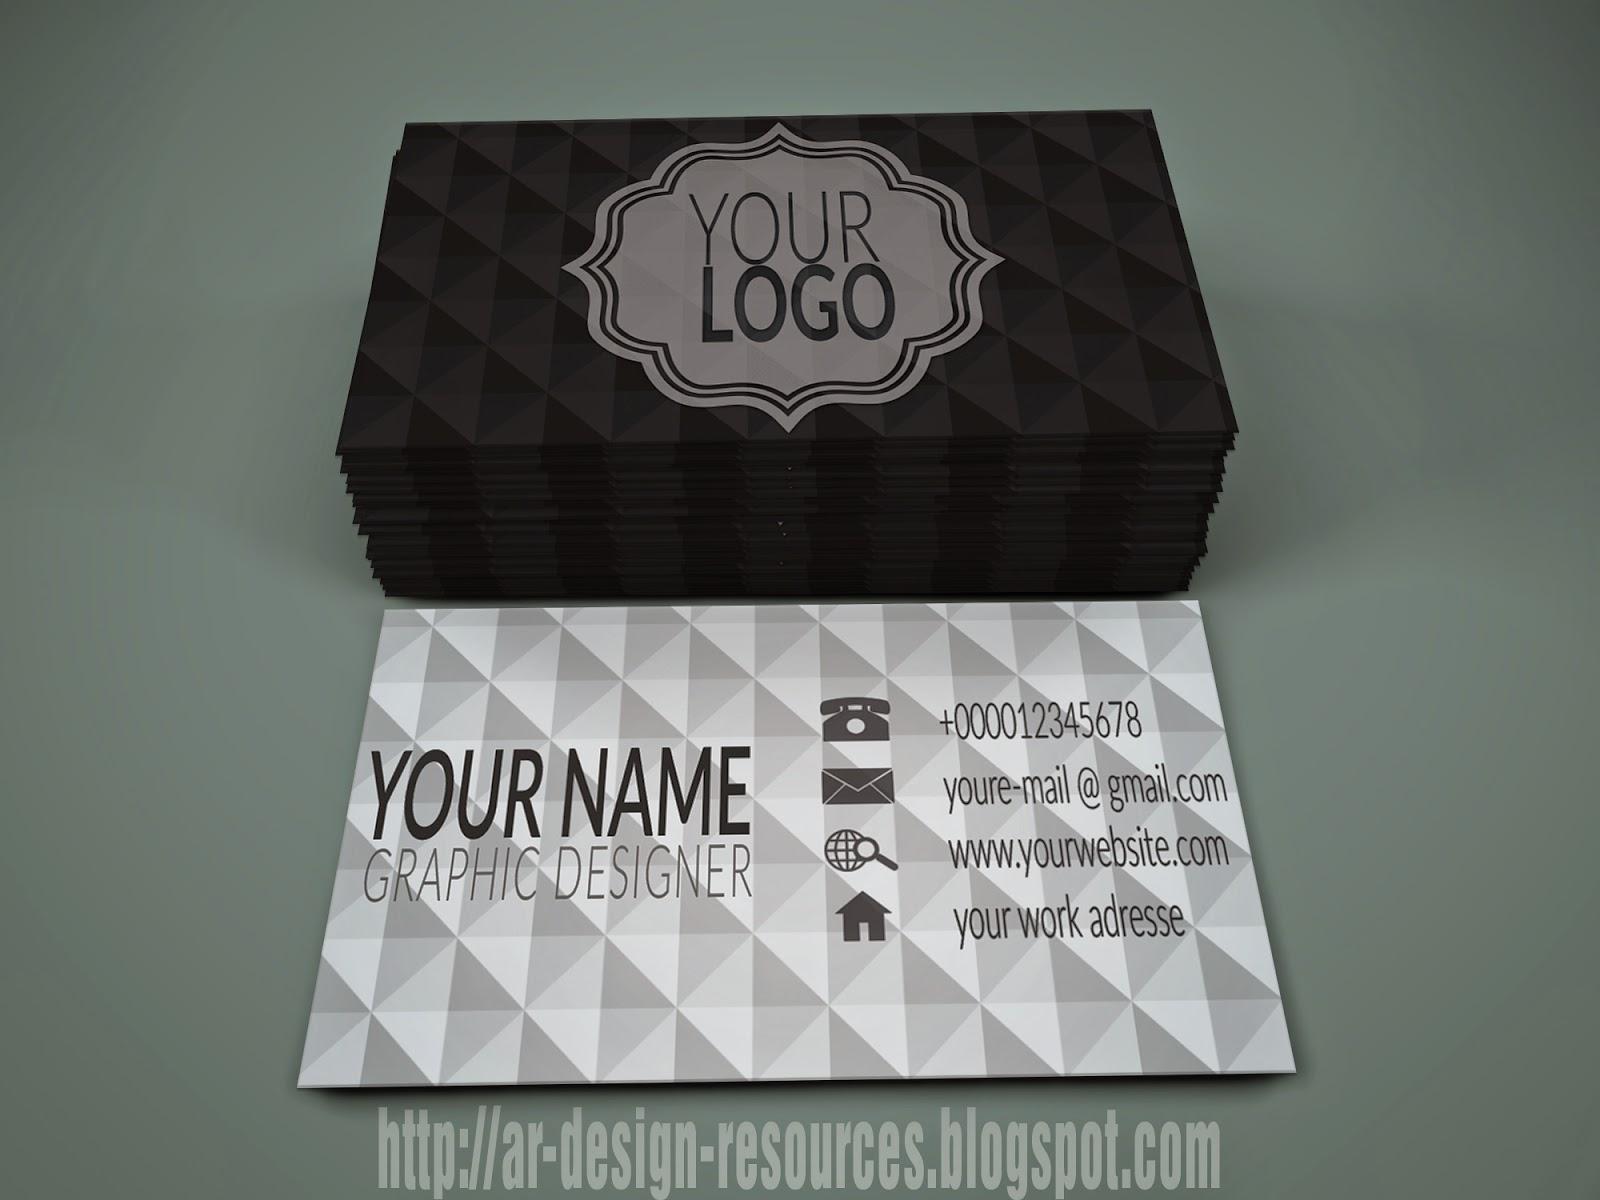 http://2.bp.blogspot.com/-o9QQY4MoQa4/VA7wSa5fbUI/AAAAAAAAA4U/Az_cWEF449s/s1600/Creative%2Btriangle%2BPersonal%2Bbusiness%2Bcard%2B-%2BMOCKUP%2B01.jpg